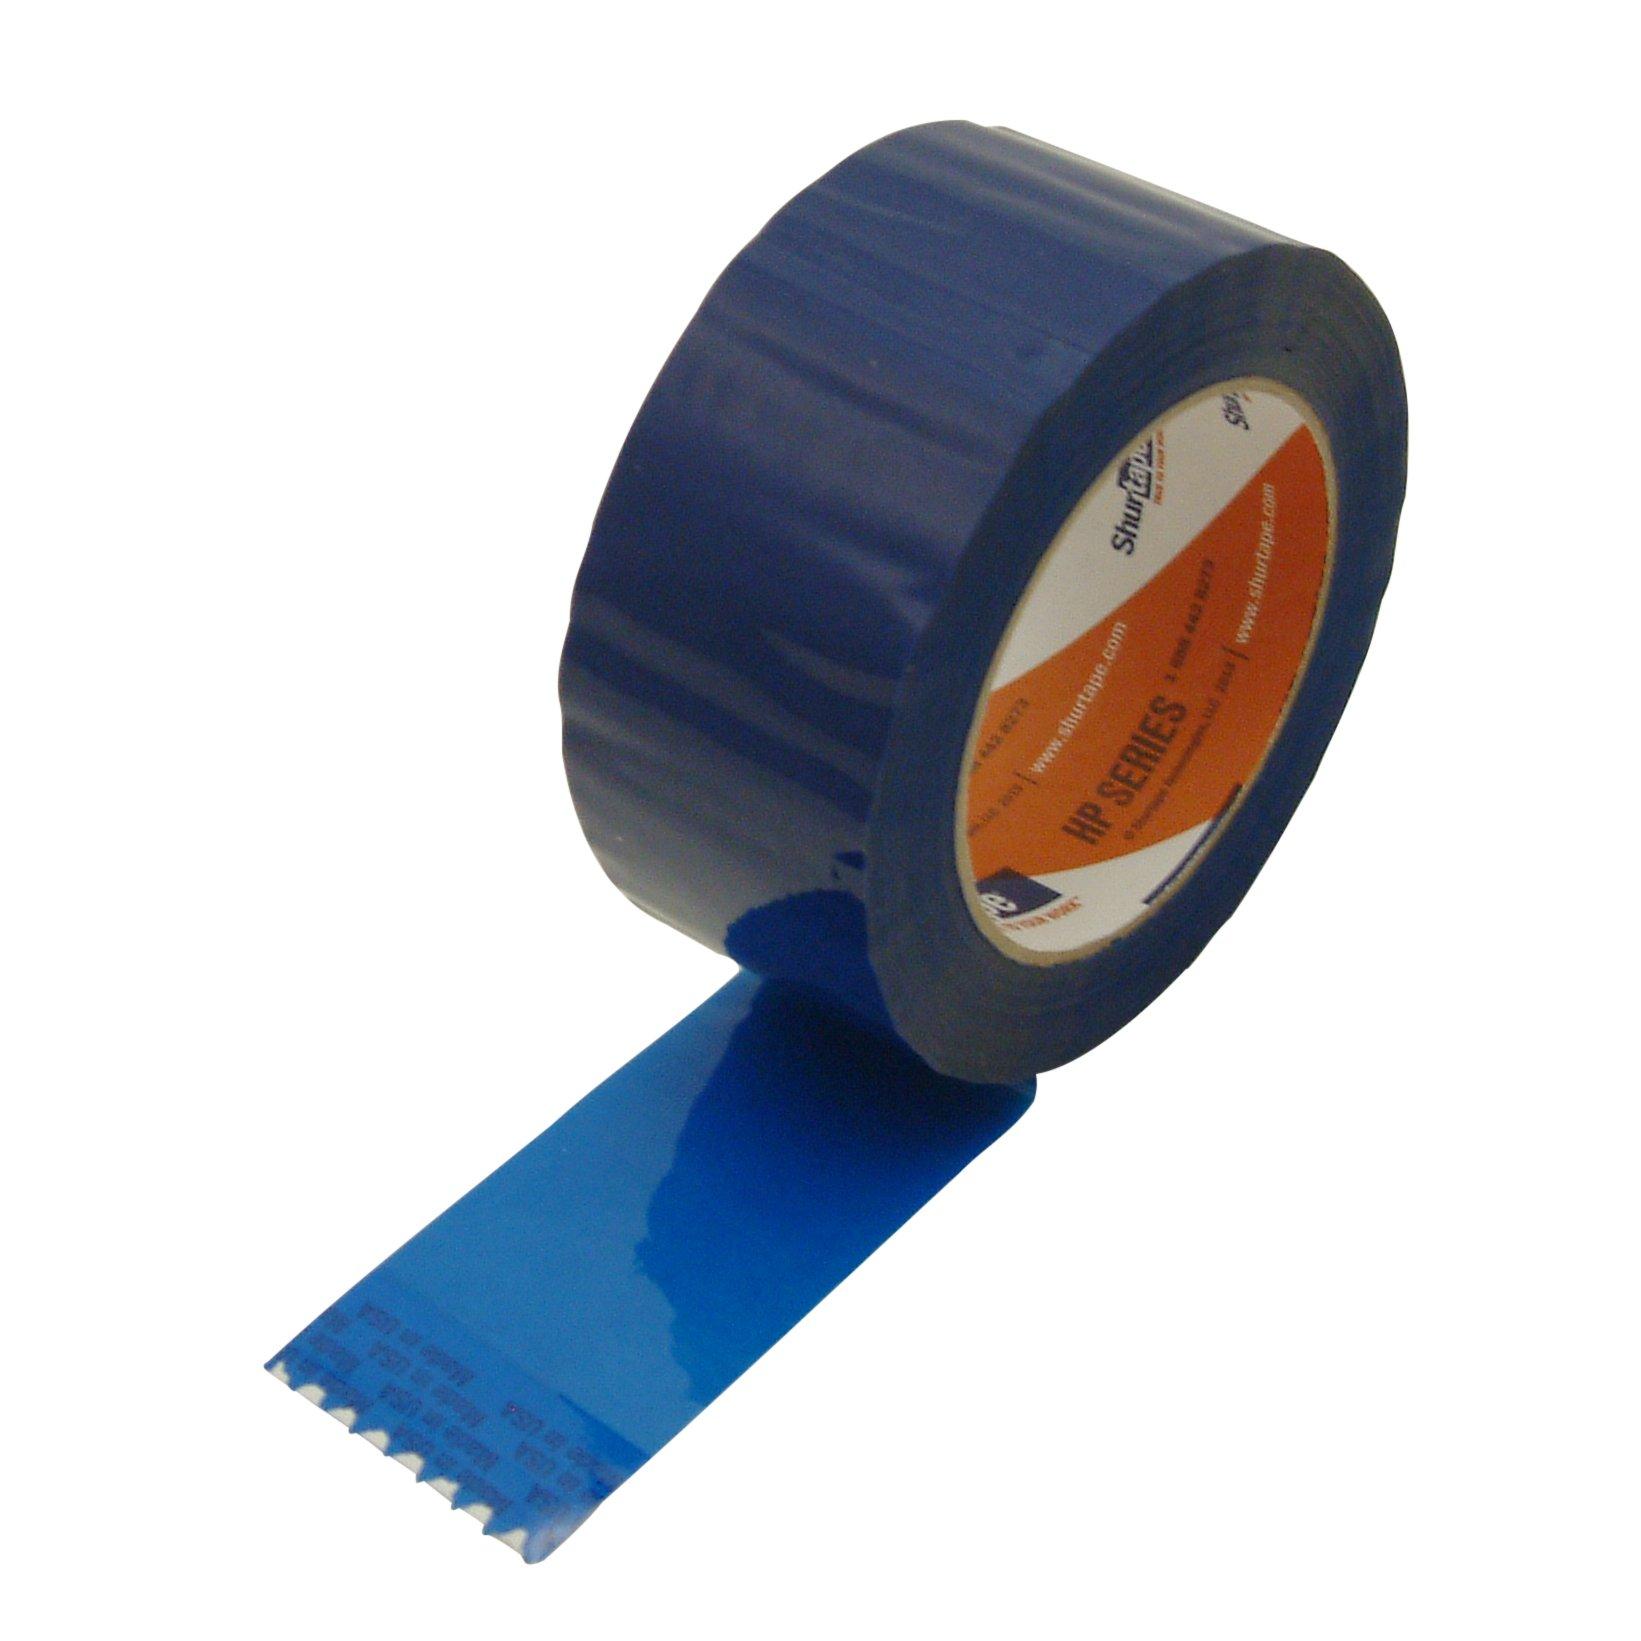 "Shurtape HP-200C/BLU2110 HP-200C Production-Grade Colored Packaging Tape: 2"" x 110 yd., Blue"